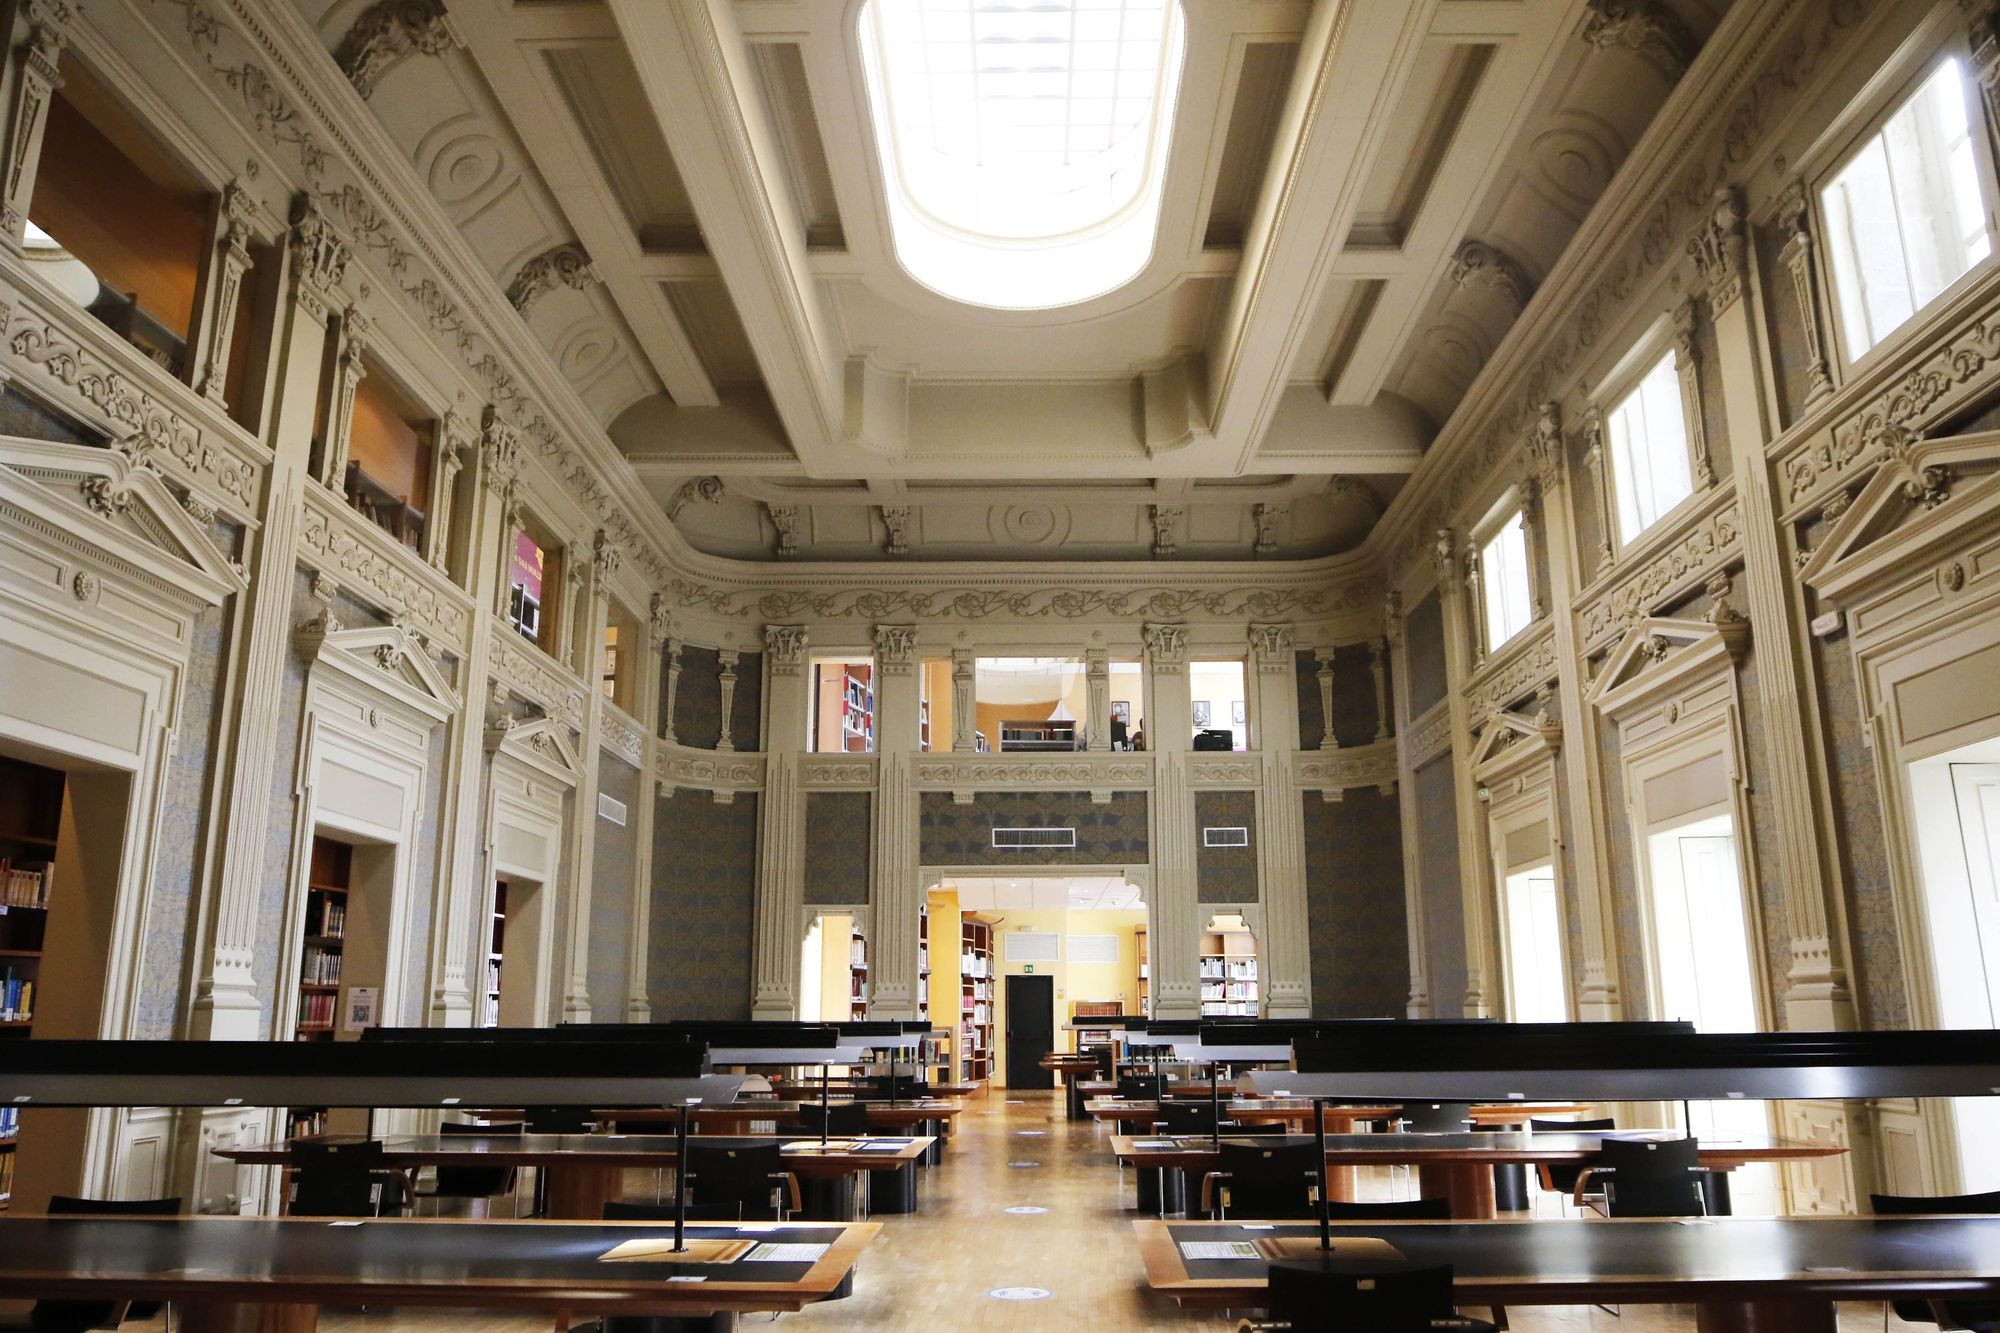 23.interior biblioteca juan compa�el alba villar.JPG